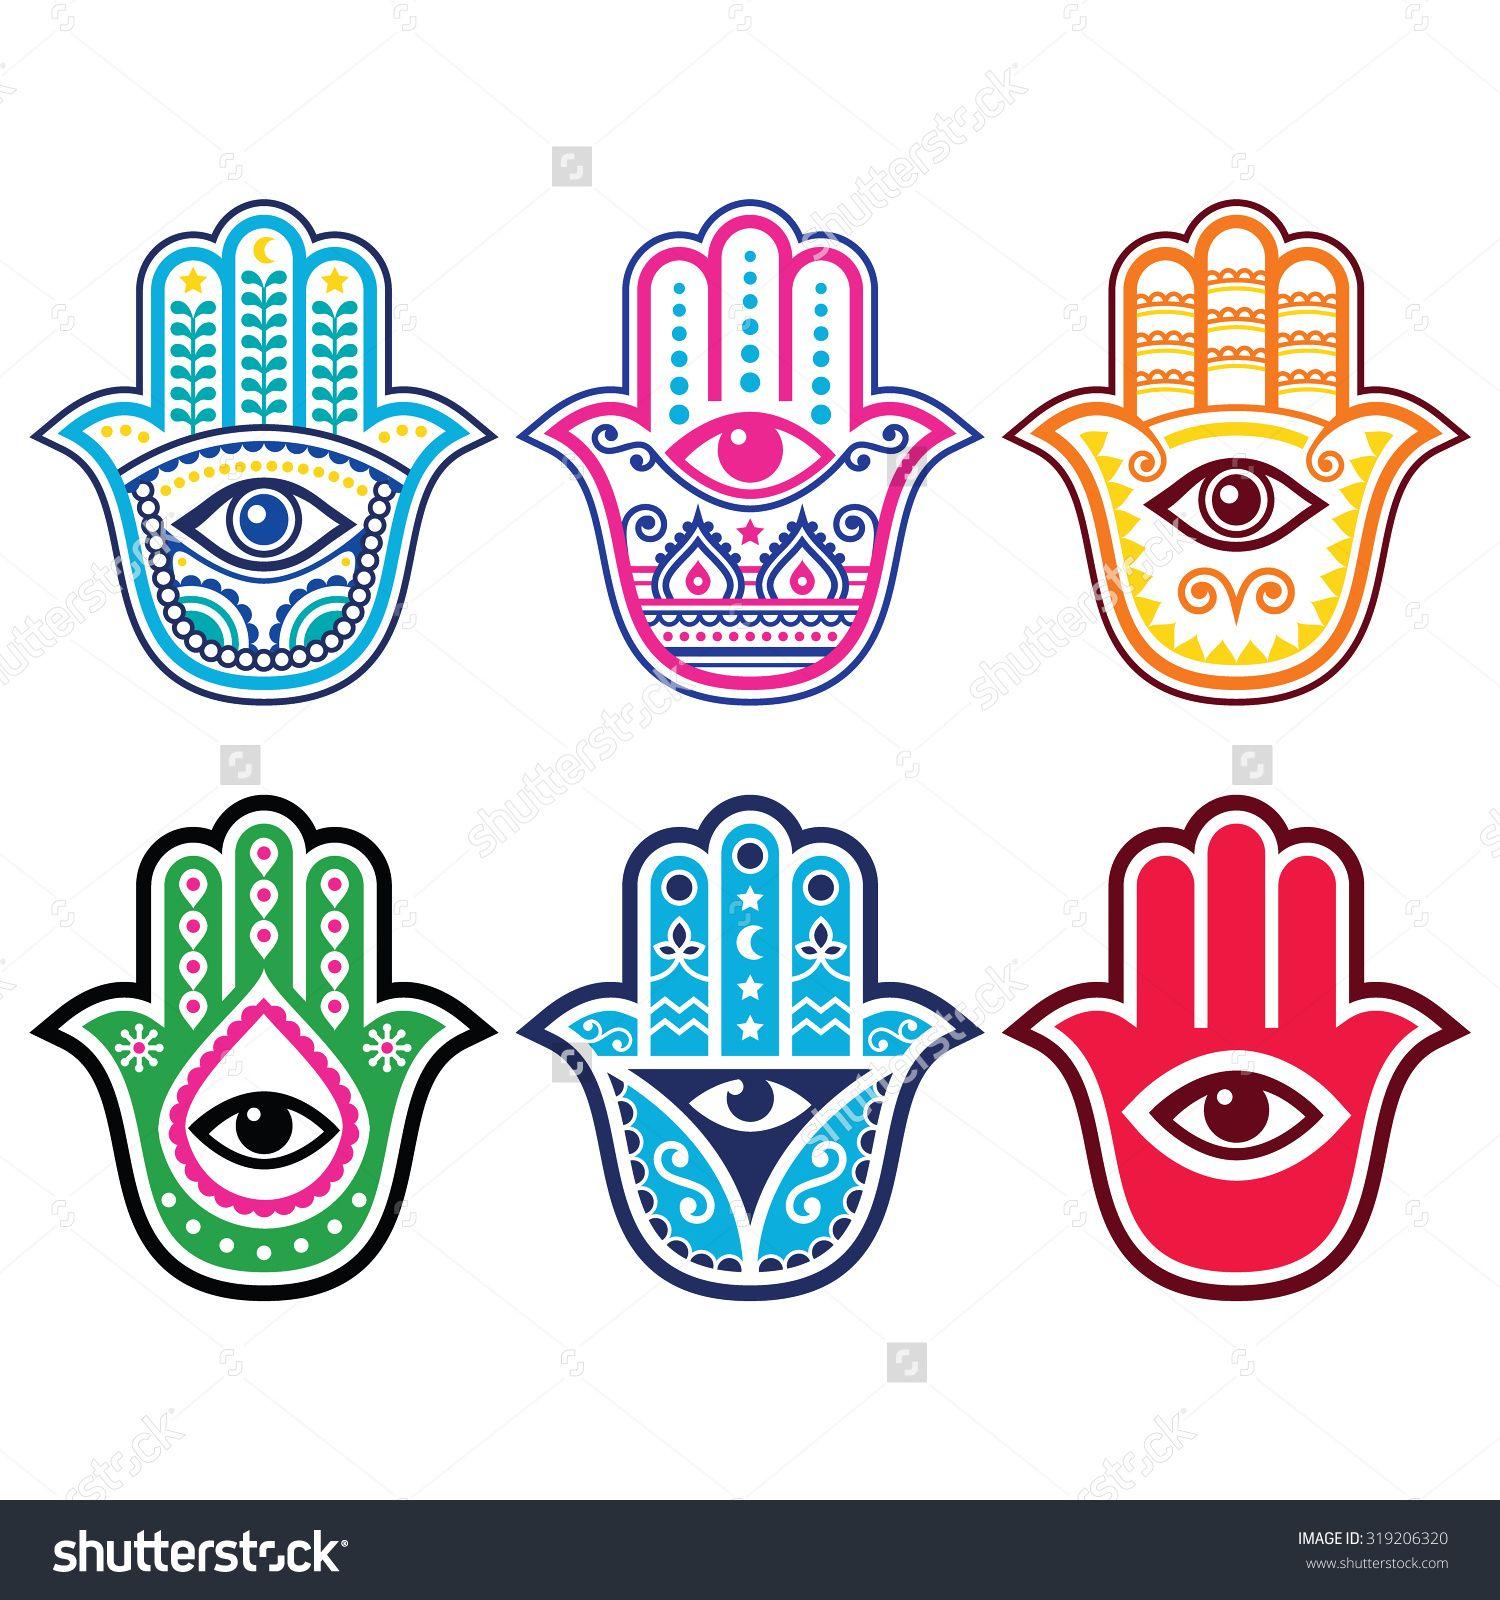 Hamsa hand hand of fatima amulet symbol of protection from hamsa hand hand of fatima amulet symbol of protection from devil eye biocorpaavc